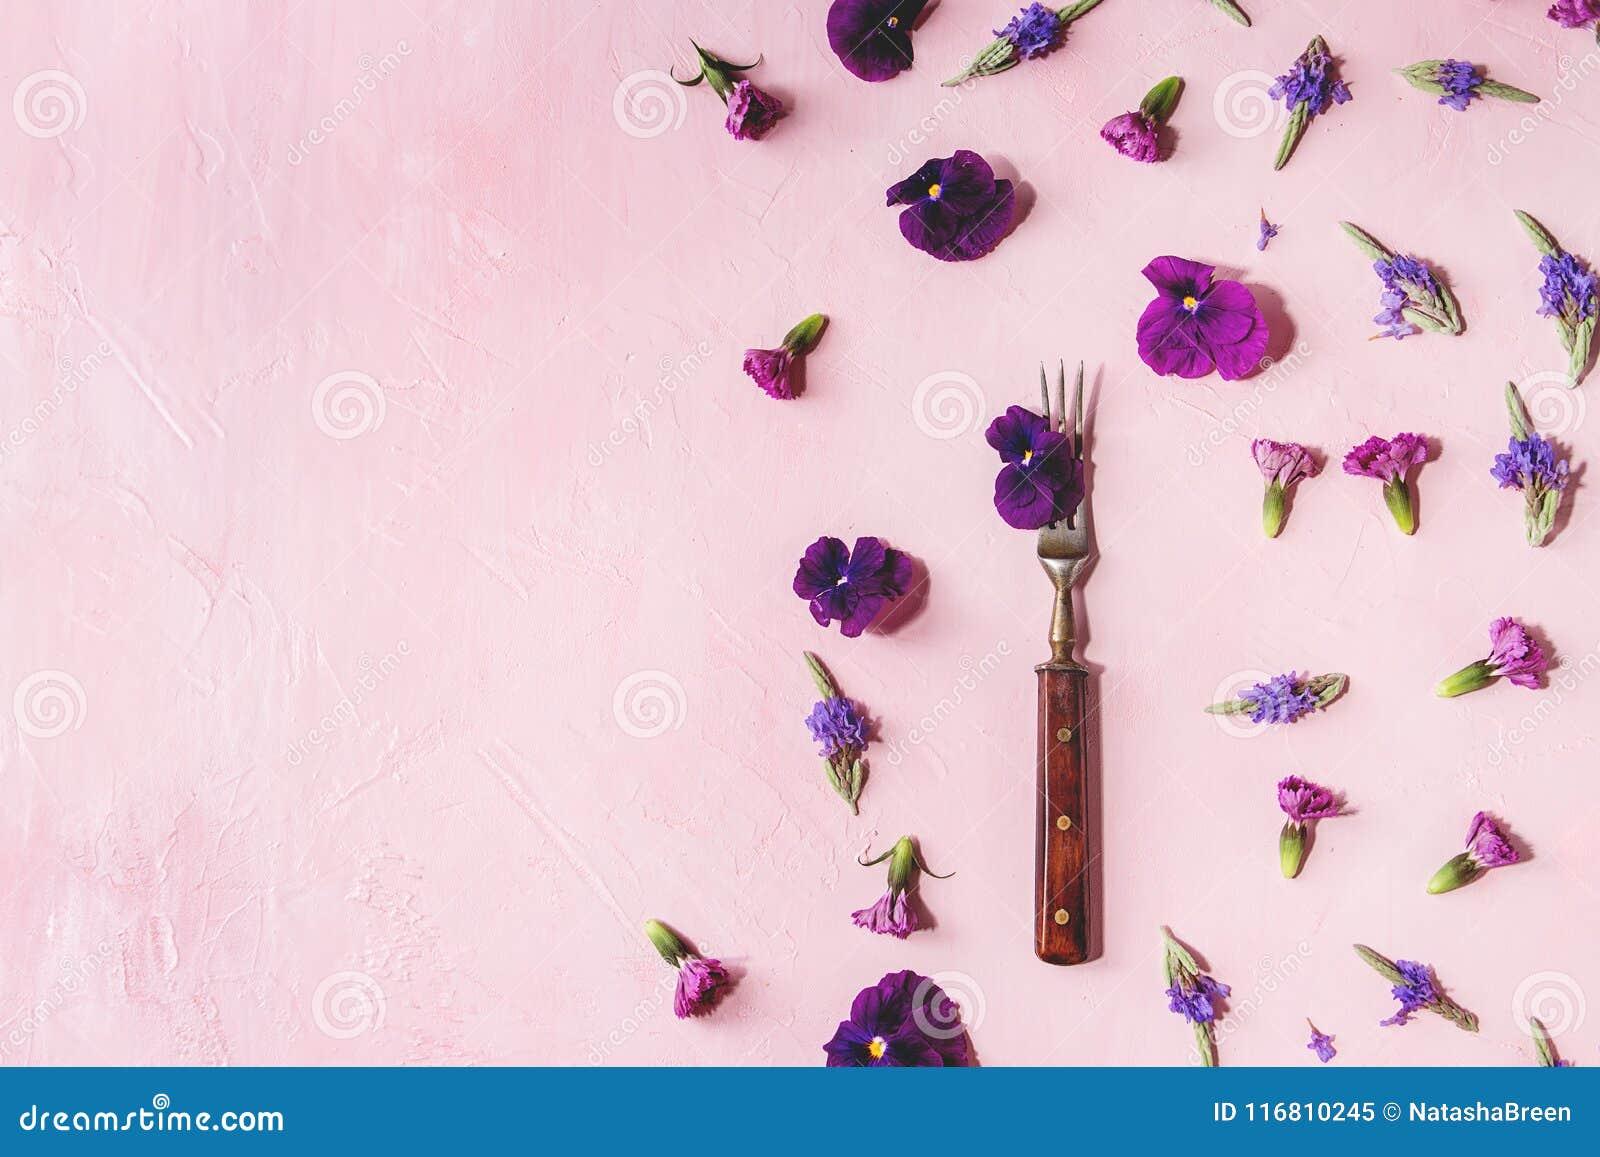 Purple Edible Flowers Stock Image Image Of Flower Meal 116810245